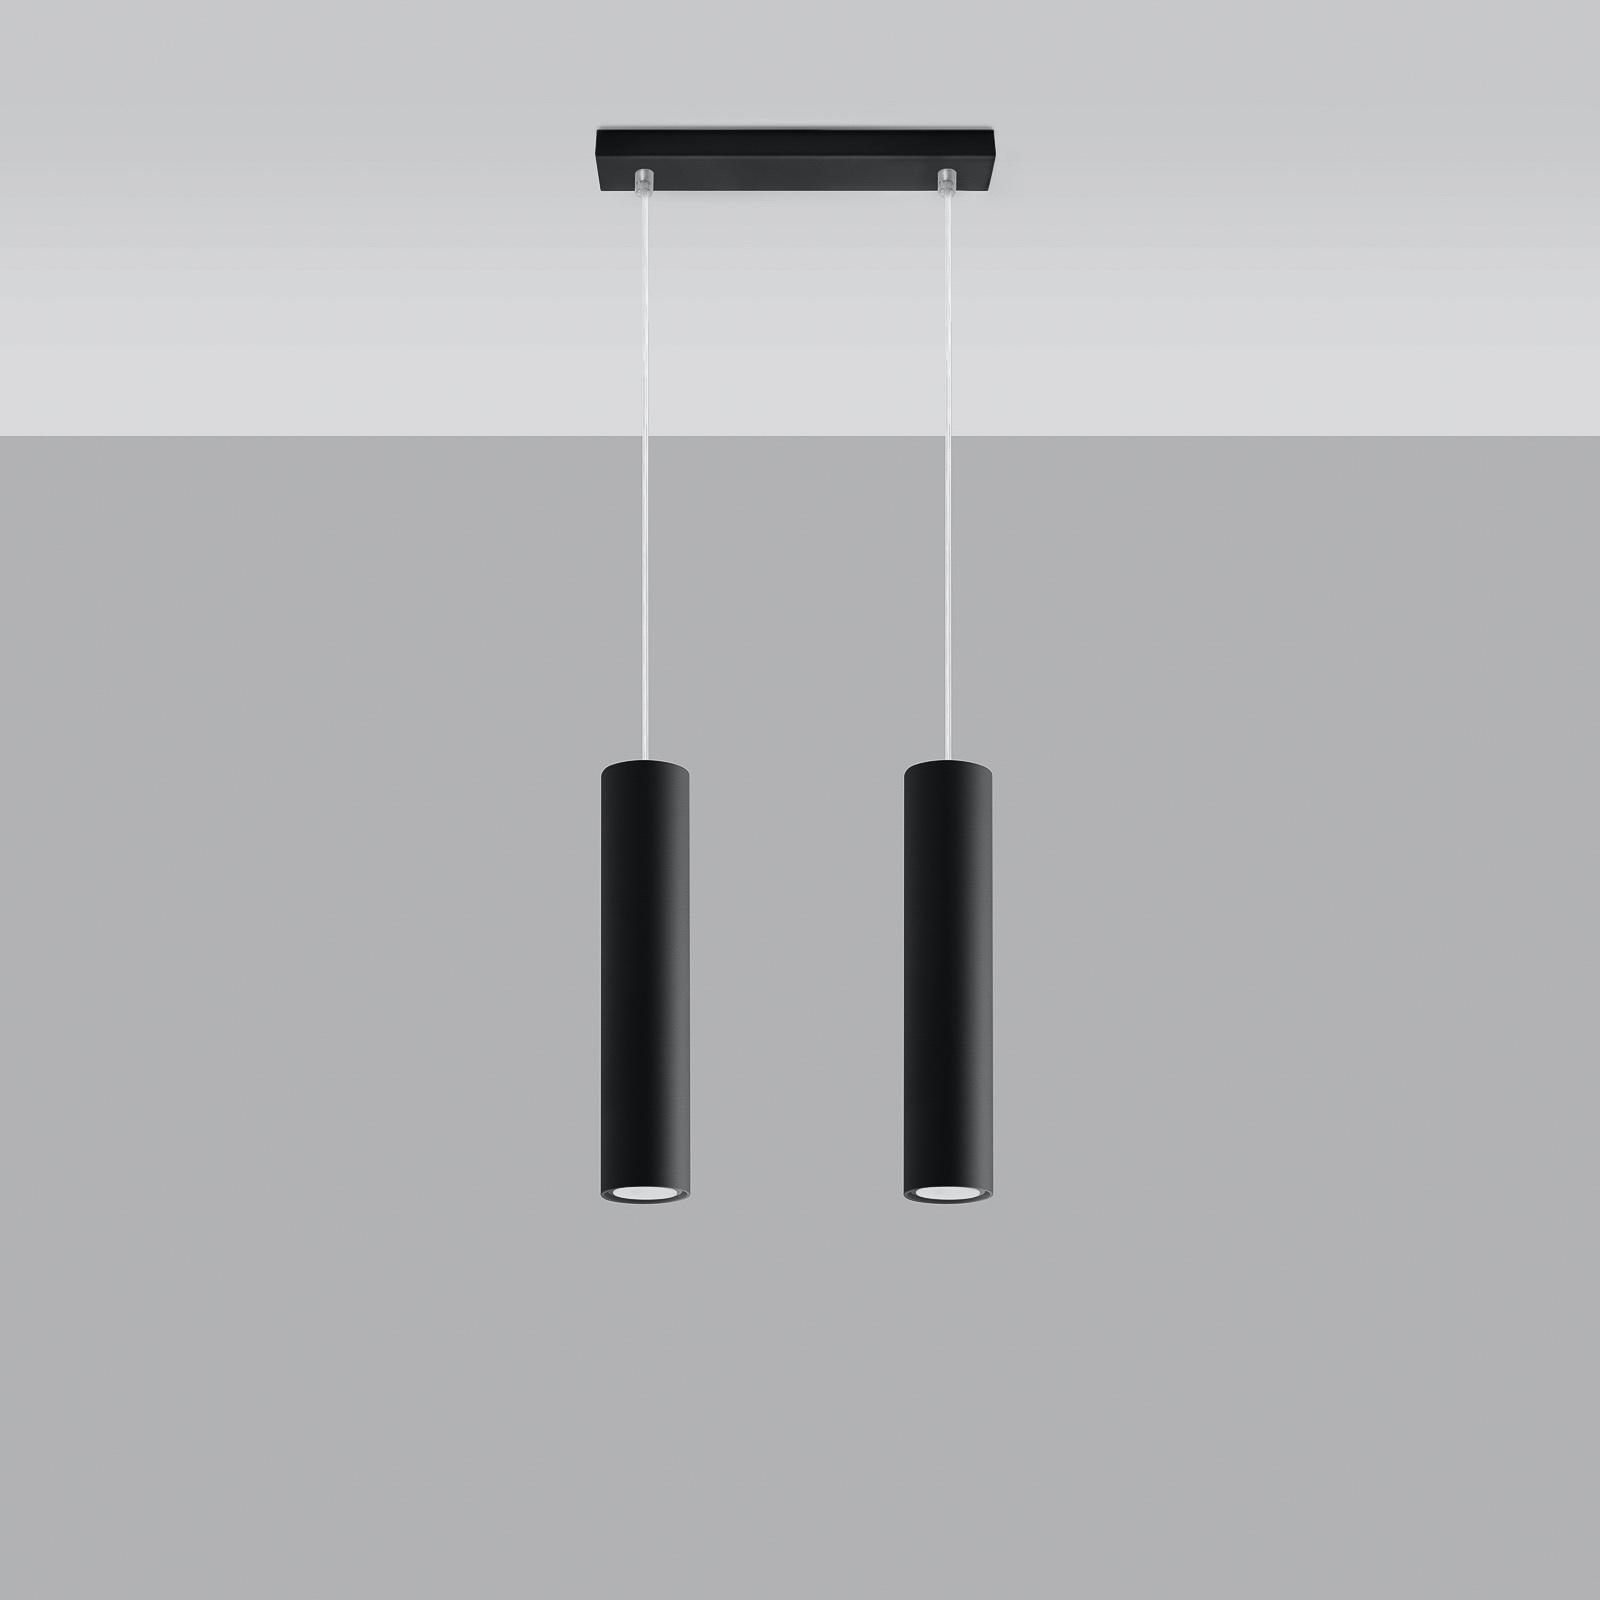 Lampa wisząca Tube, czarna, 2-punktowa